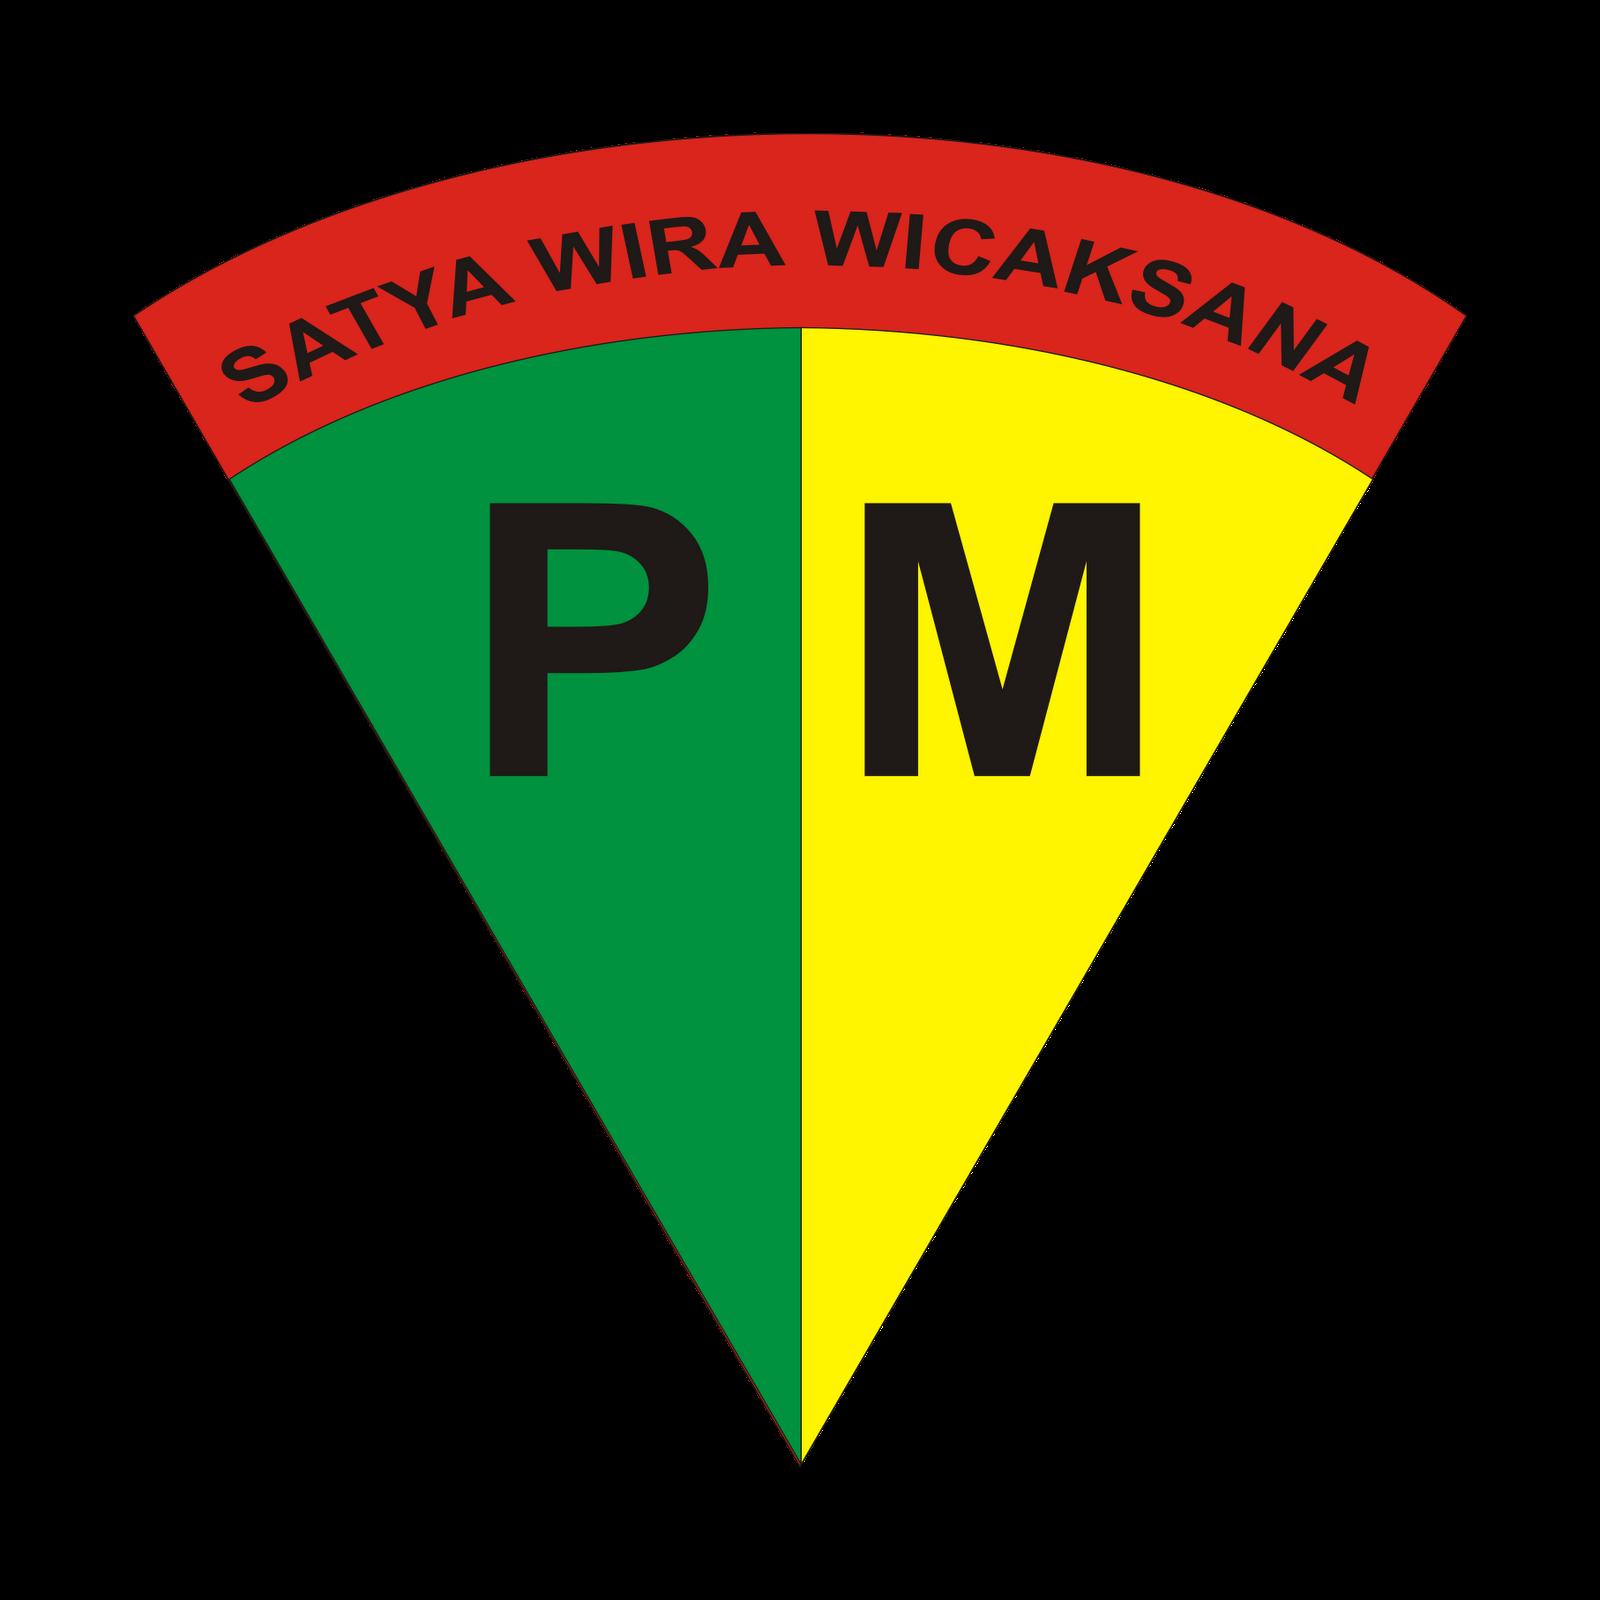 Logo militer di indonesia